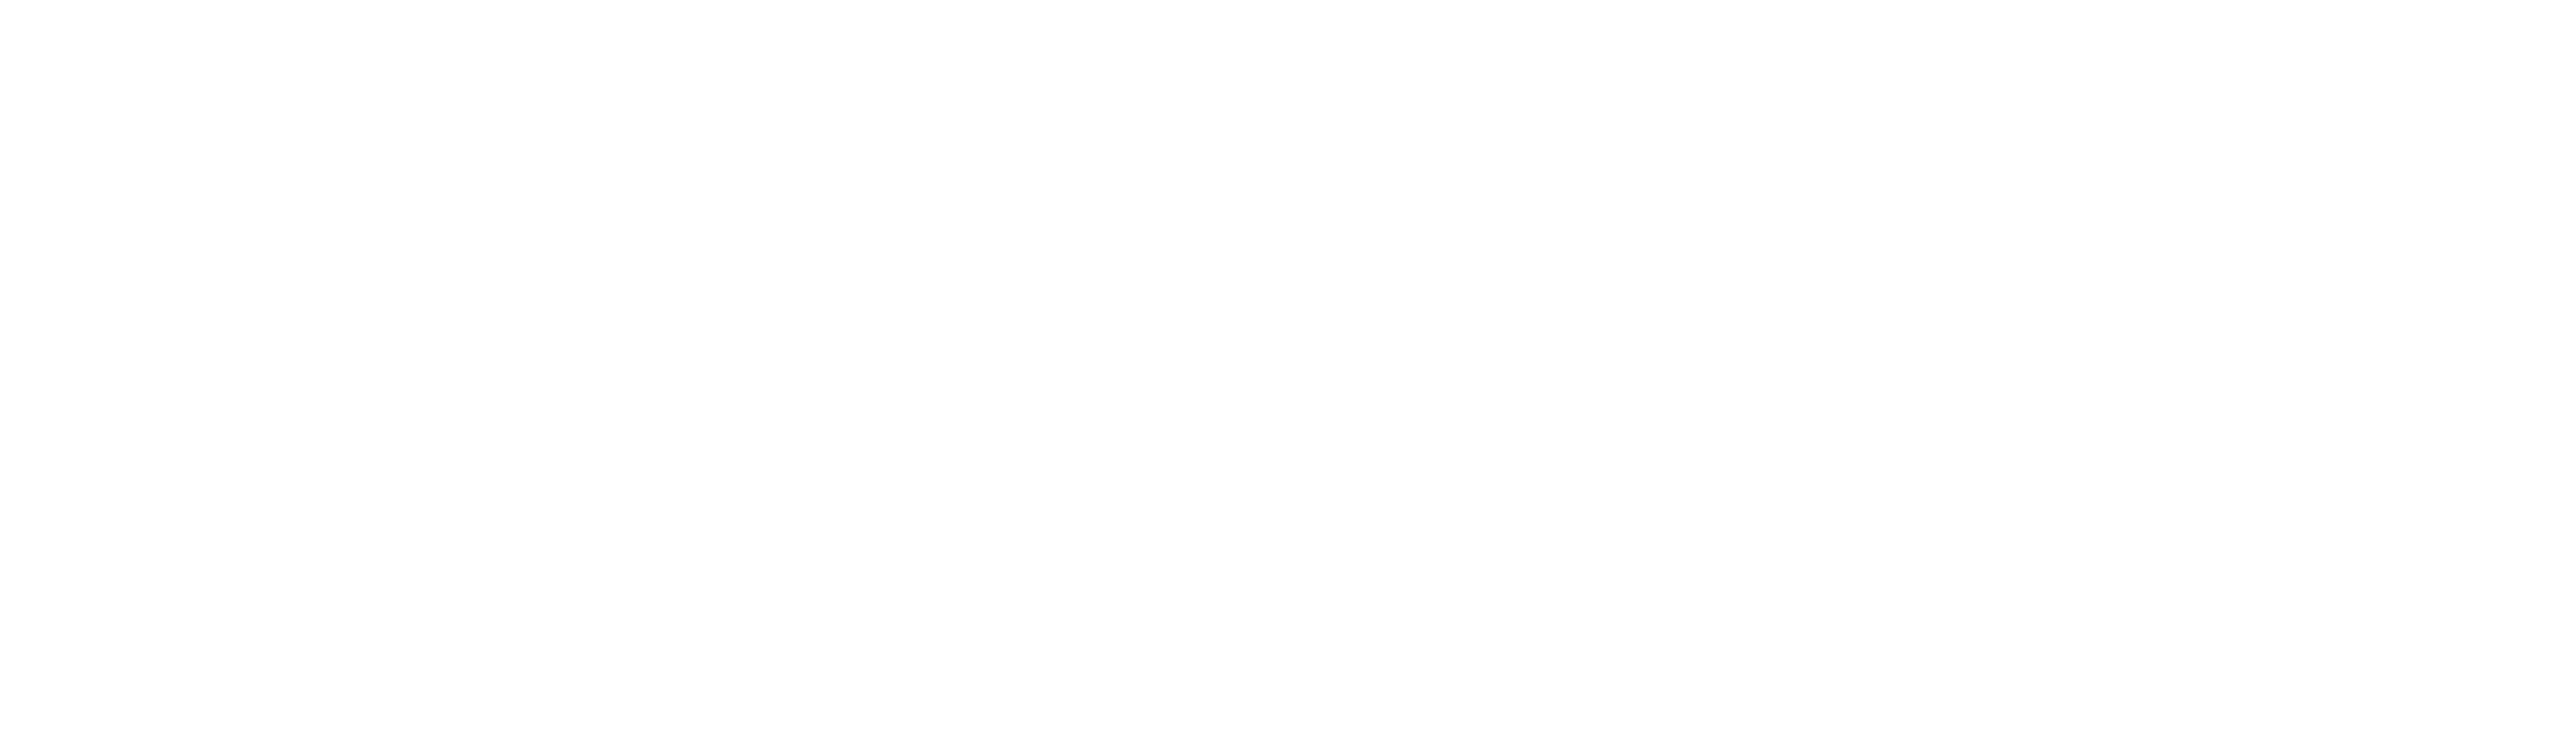 Fedex logo white